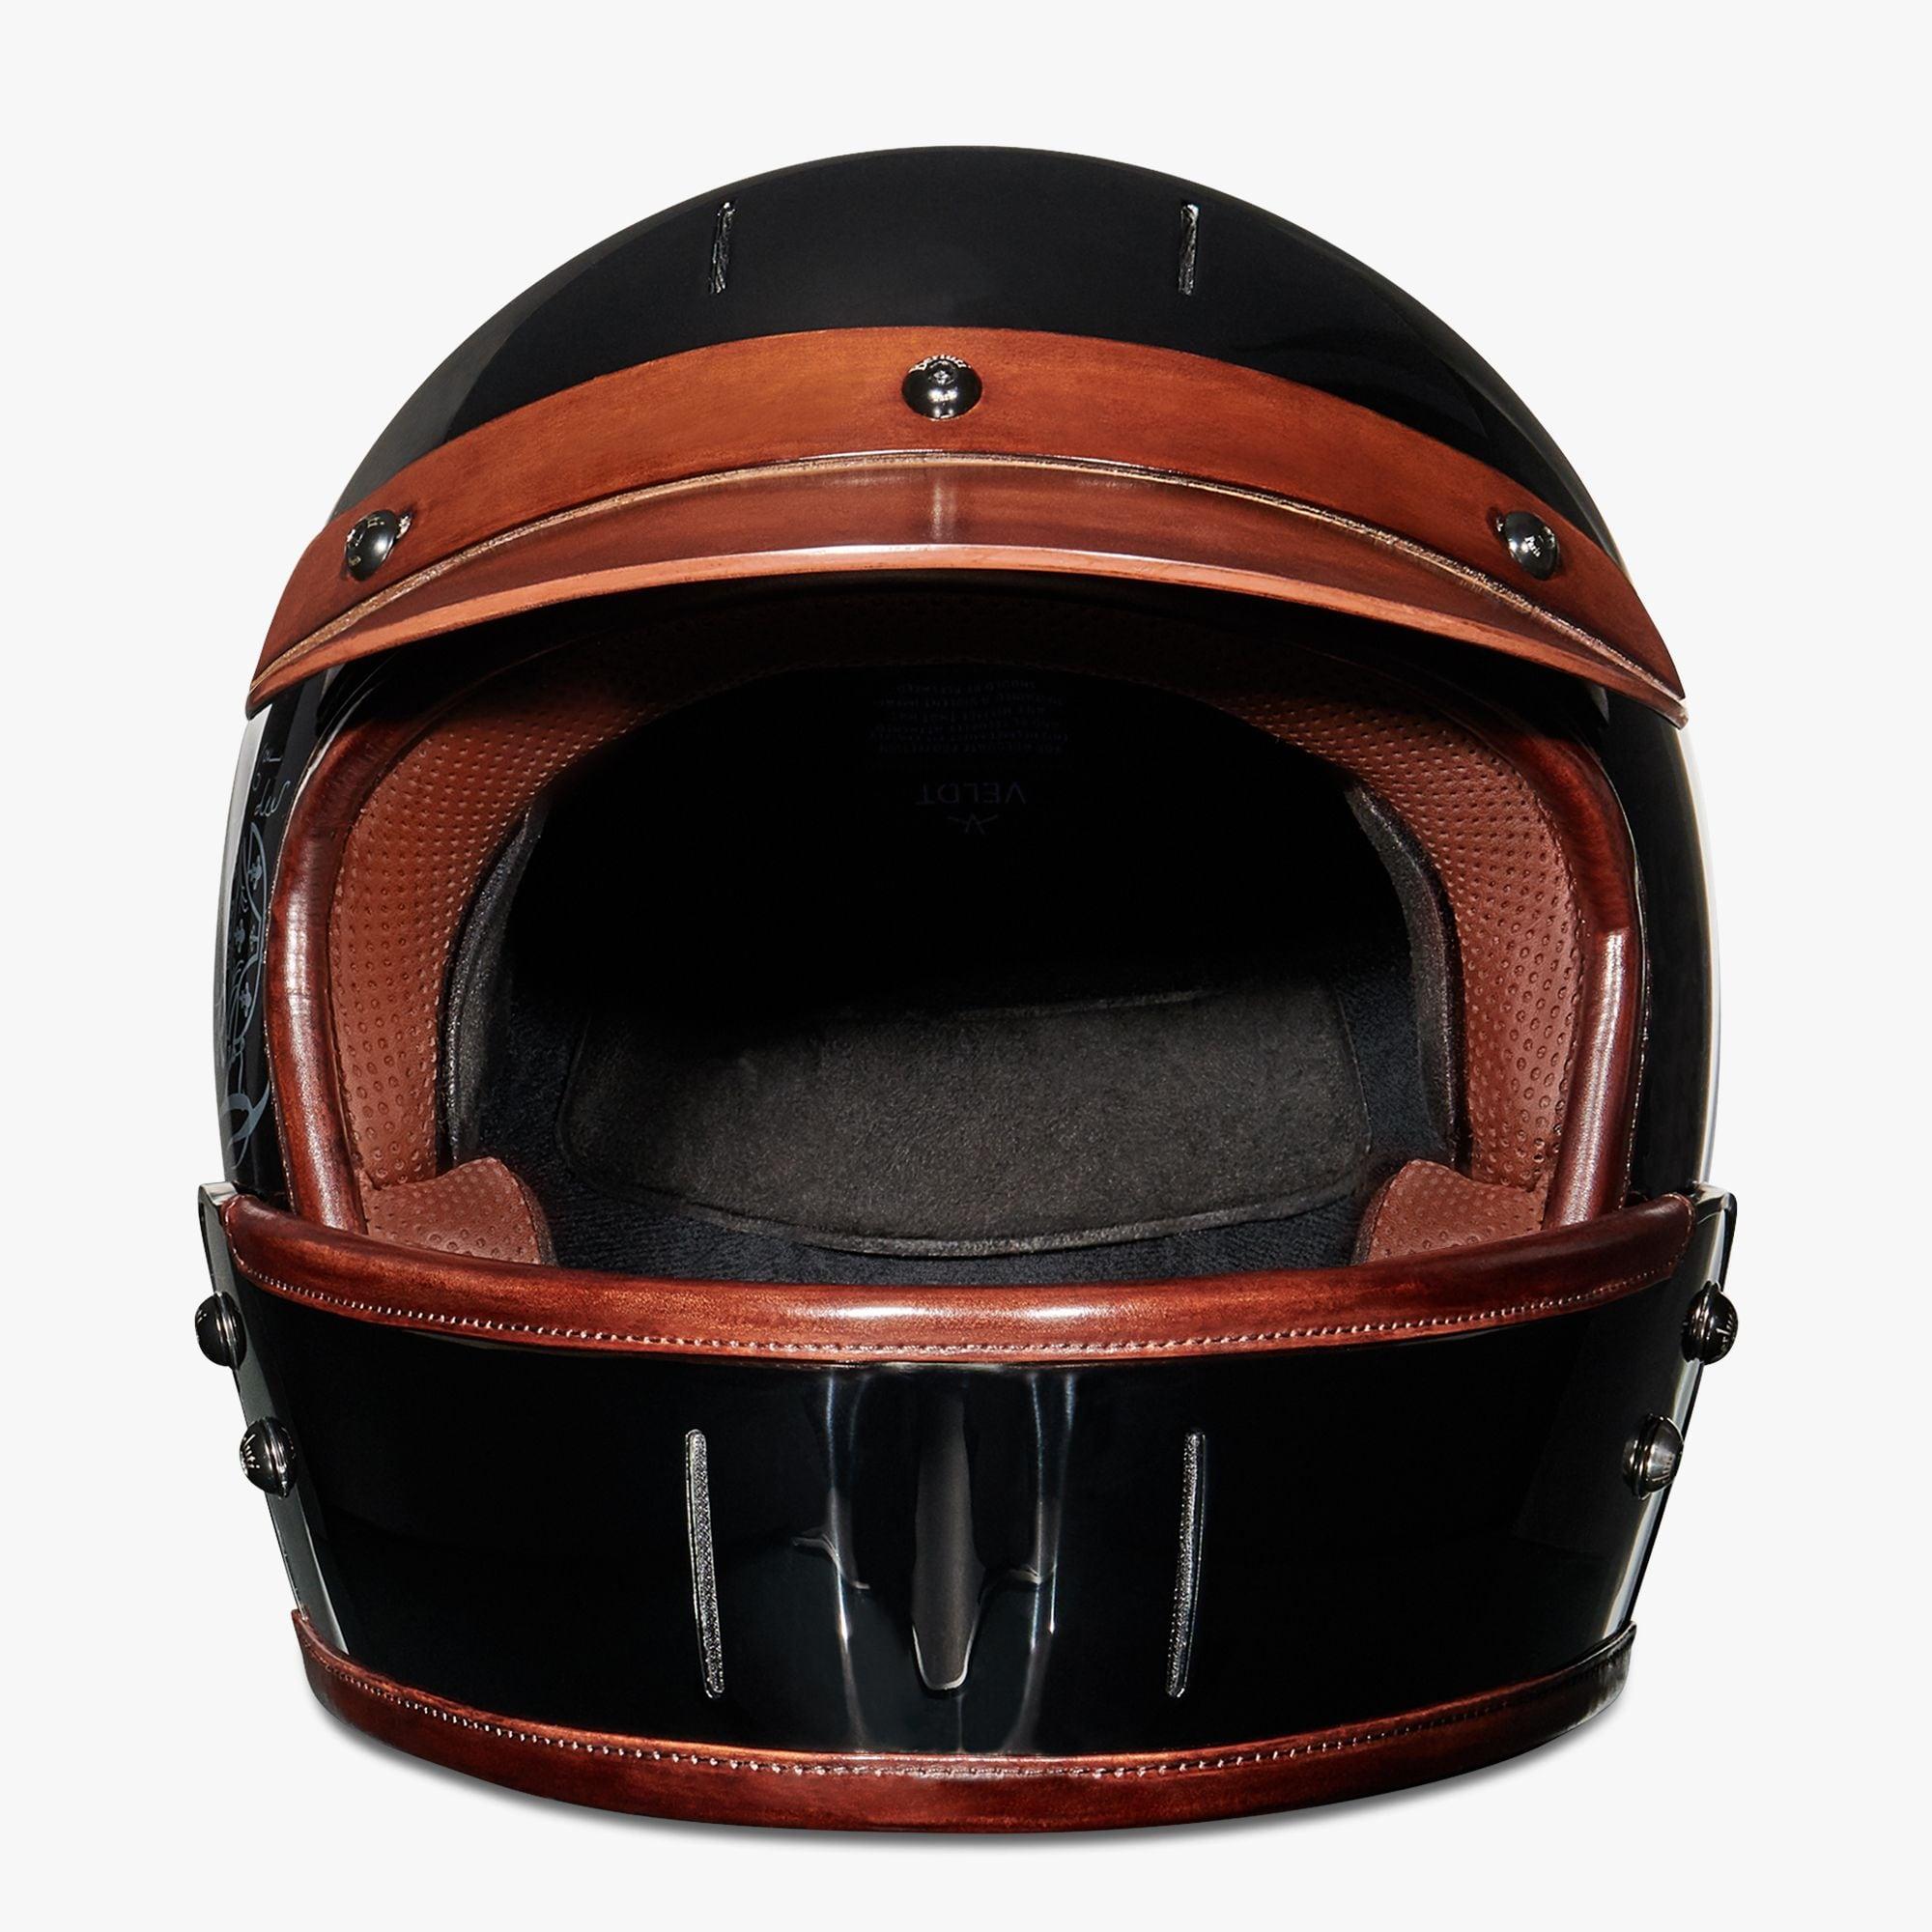 Berluti Luxury Leather Motorcycle Helmet